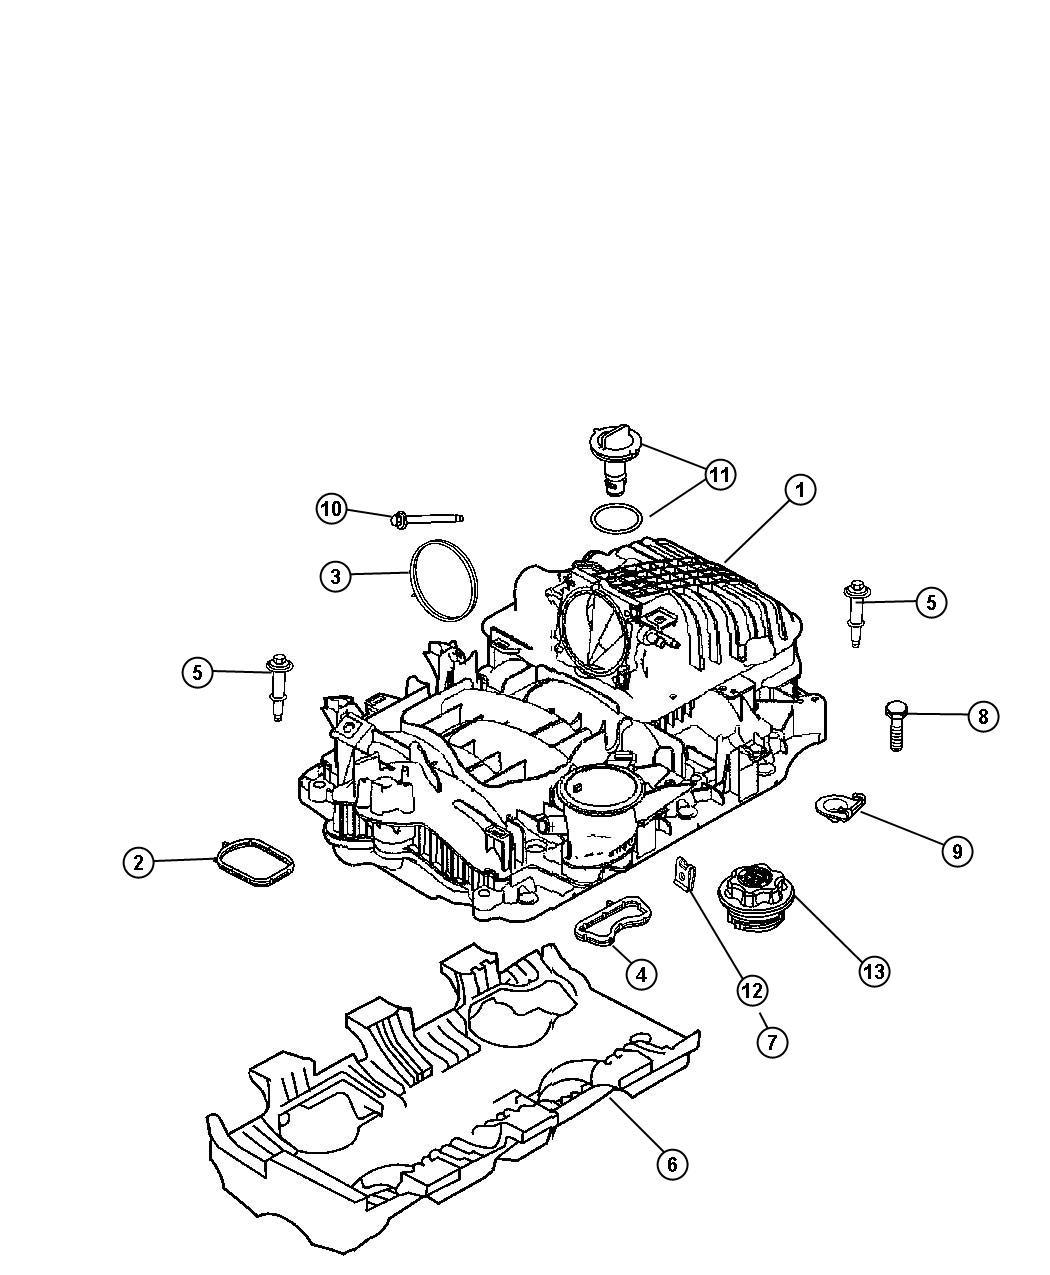 Chrysler Aspen Manifold package. Intake. Cab, manifolds